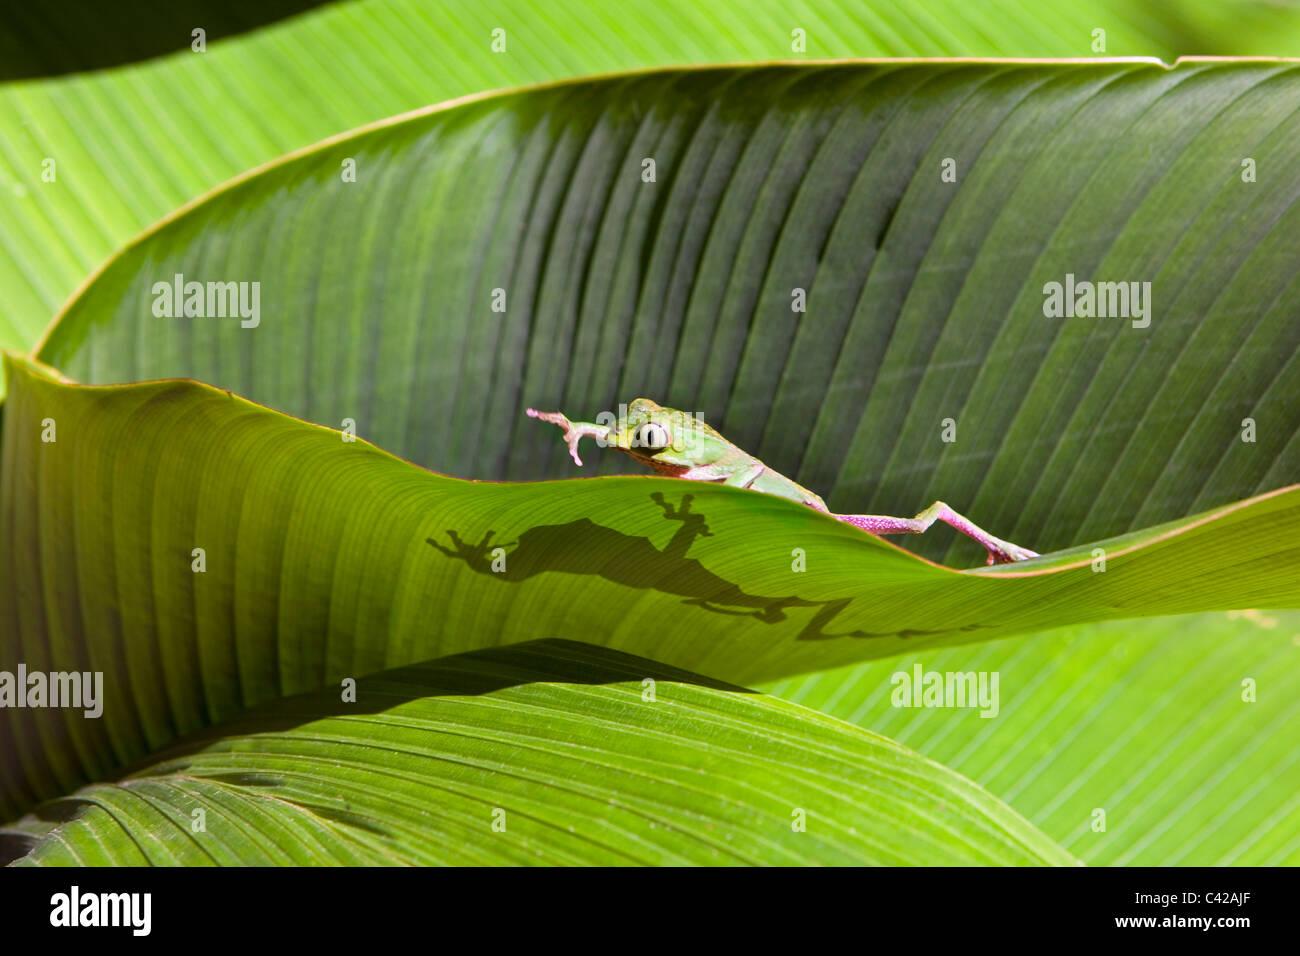 Peru, Cruz de Mayo, Manu Nationalpark, Fredy Berge. Weiß gesäumt Blatt Frosch ((Phyllomedusa Vaillanti). Stockbild